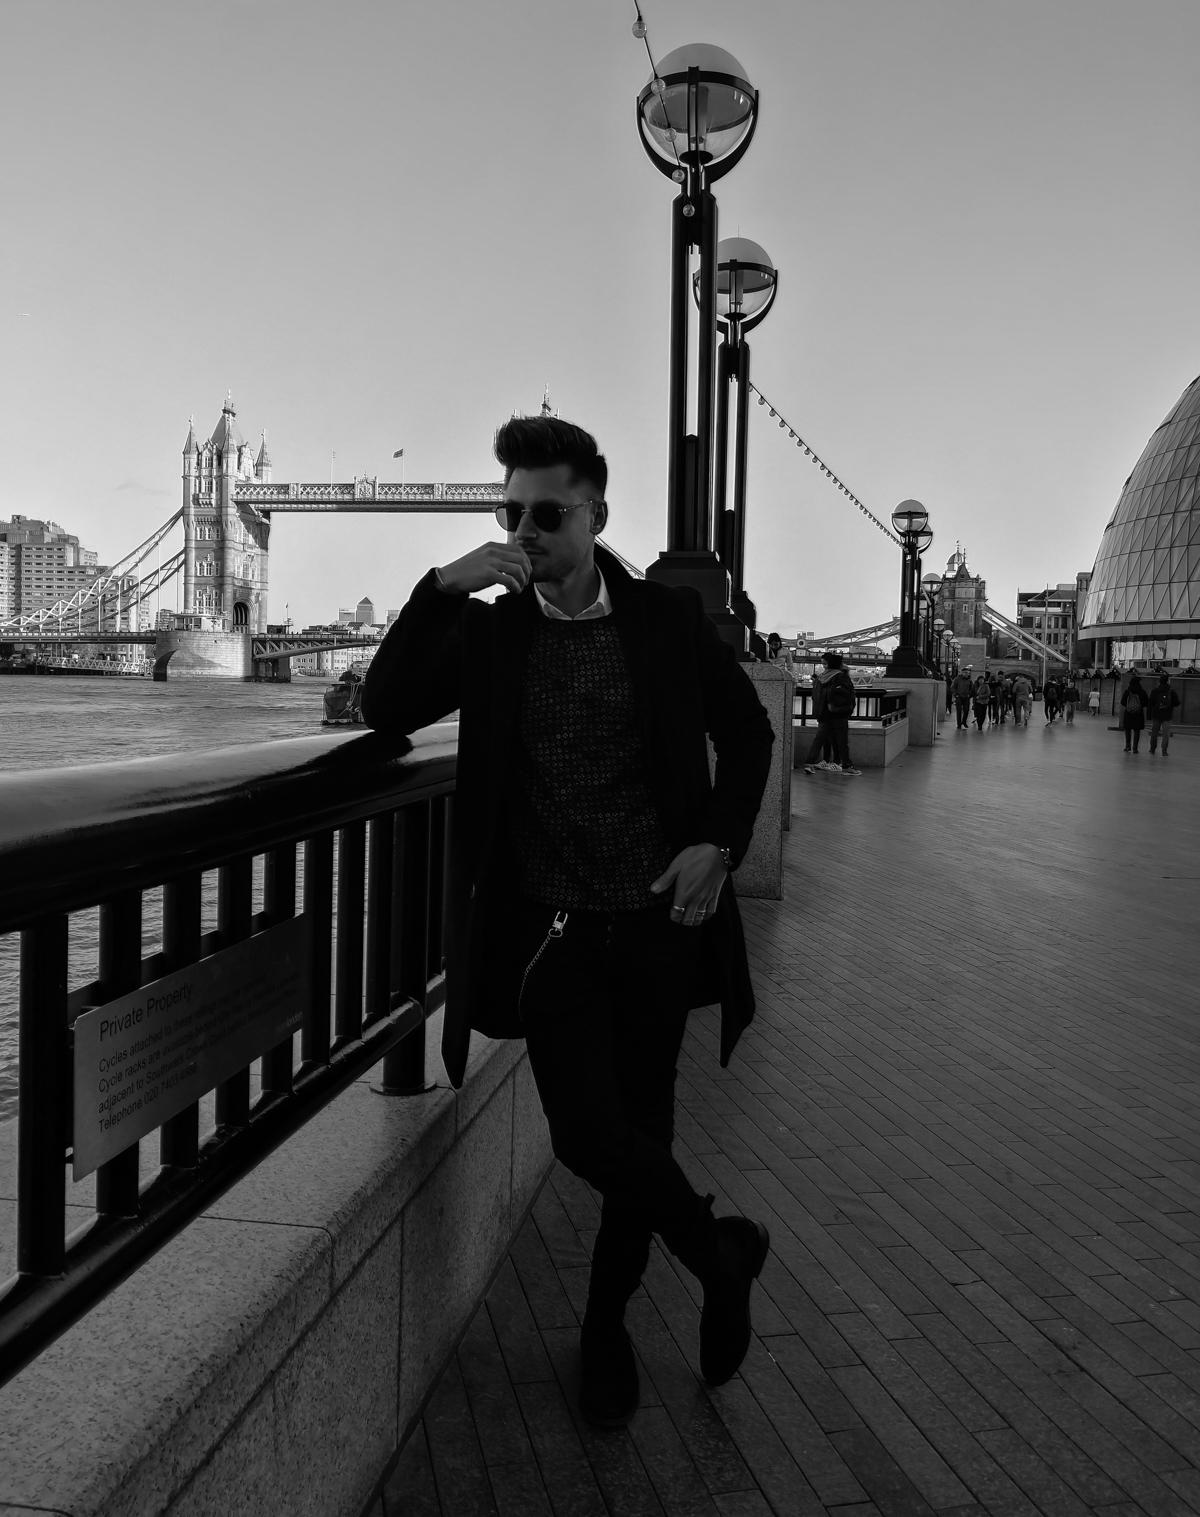 Tommeezjerry-Lifestyleblog-Fashionblog-Maennermodeblog-Maennerblog-Modeblog-Huawei-Mate-10-Pro-Monochrom-Photography-London-City